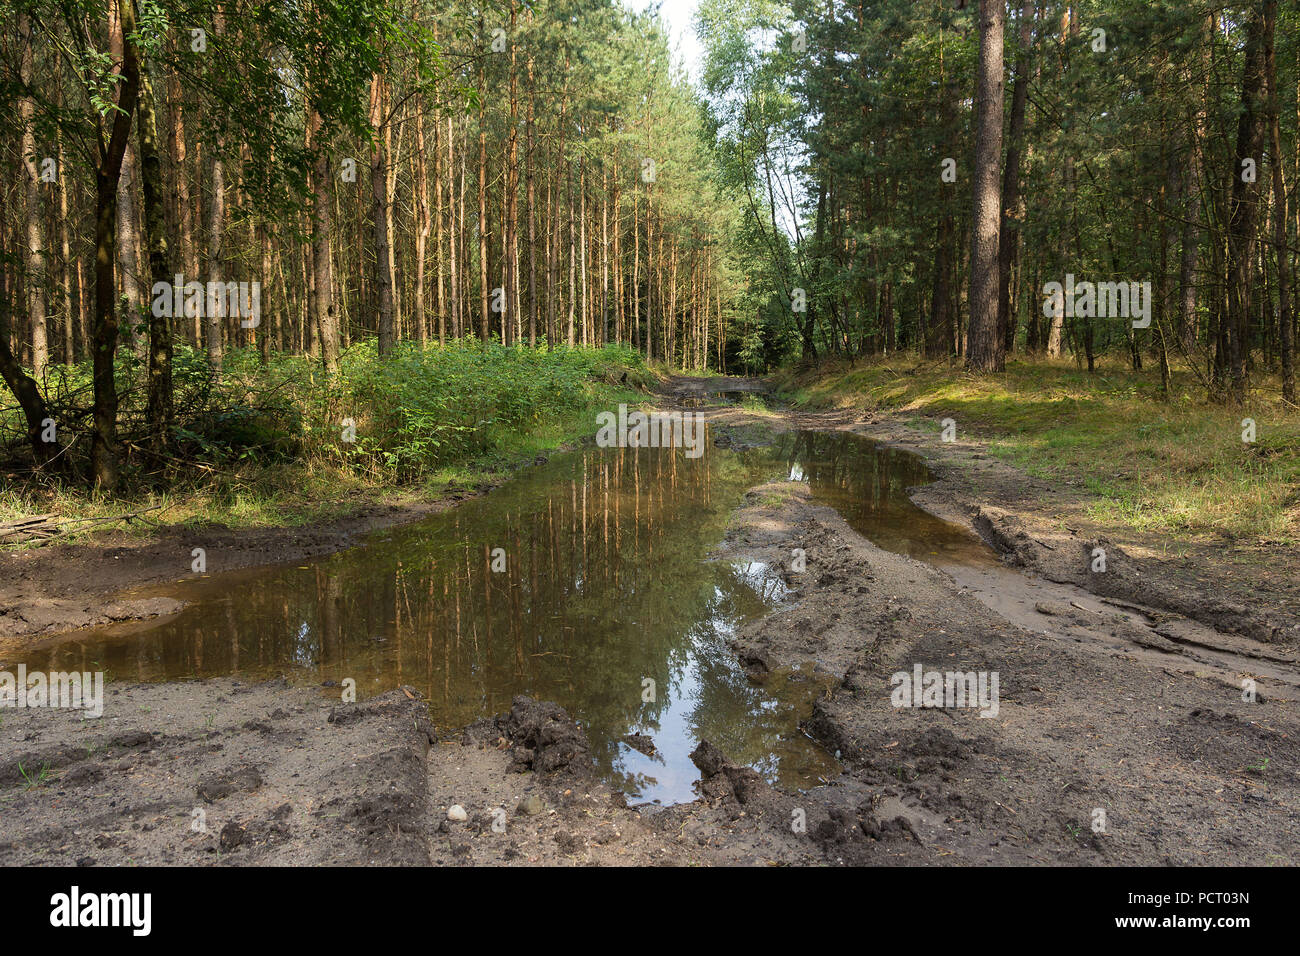 Land Brandenburg, muddy forest road, puddle - Stock Image